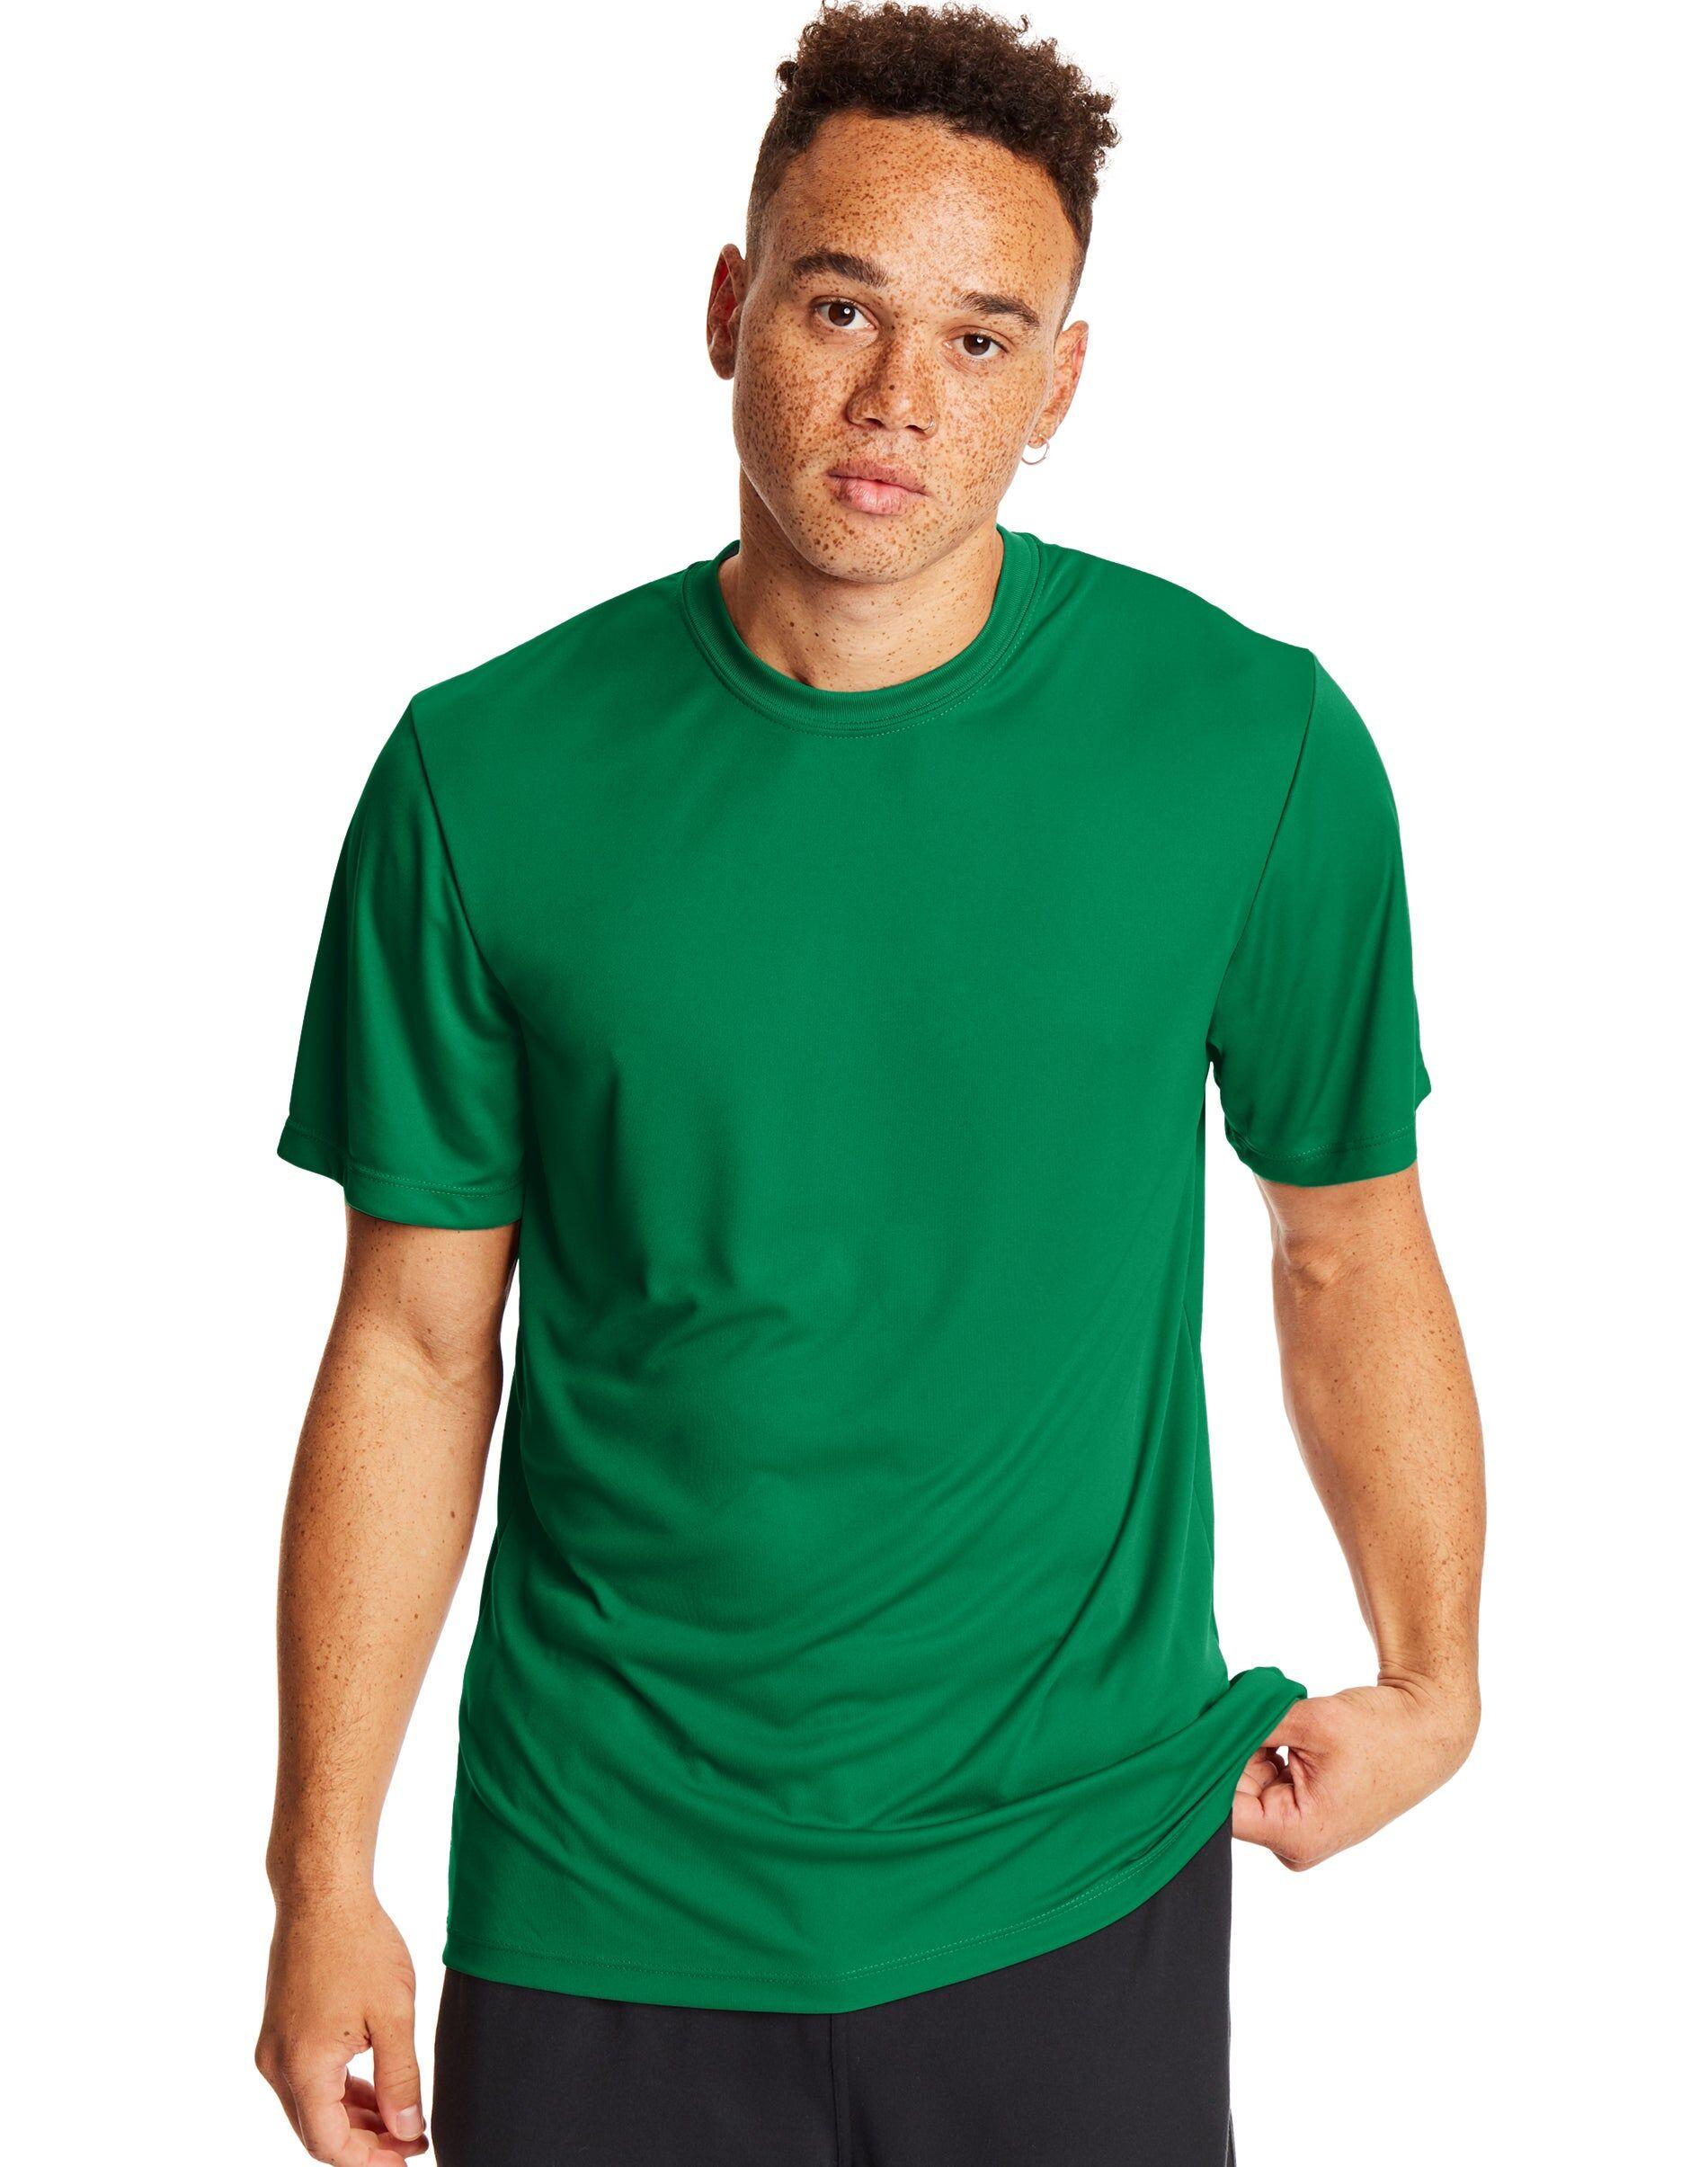 Hanes Sport Cool DRI Men's Performance Tee 2-Pack Kelly Green XL